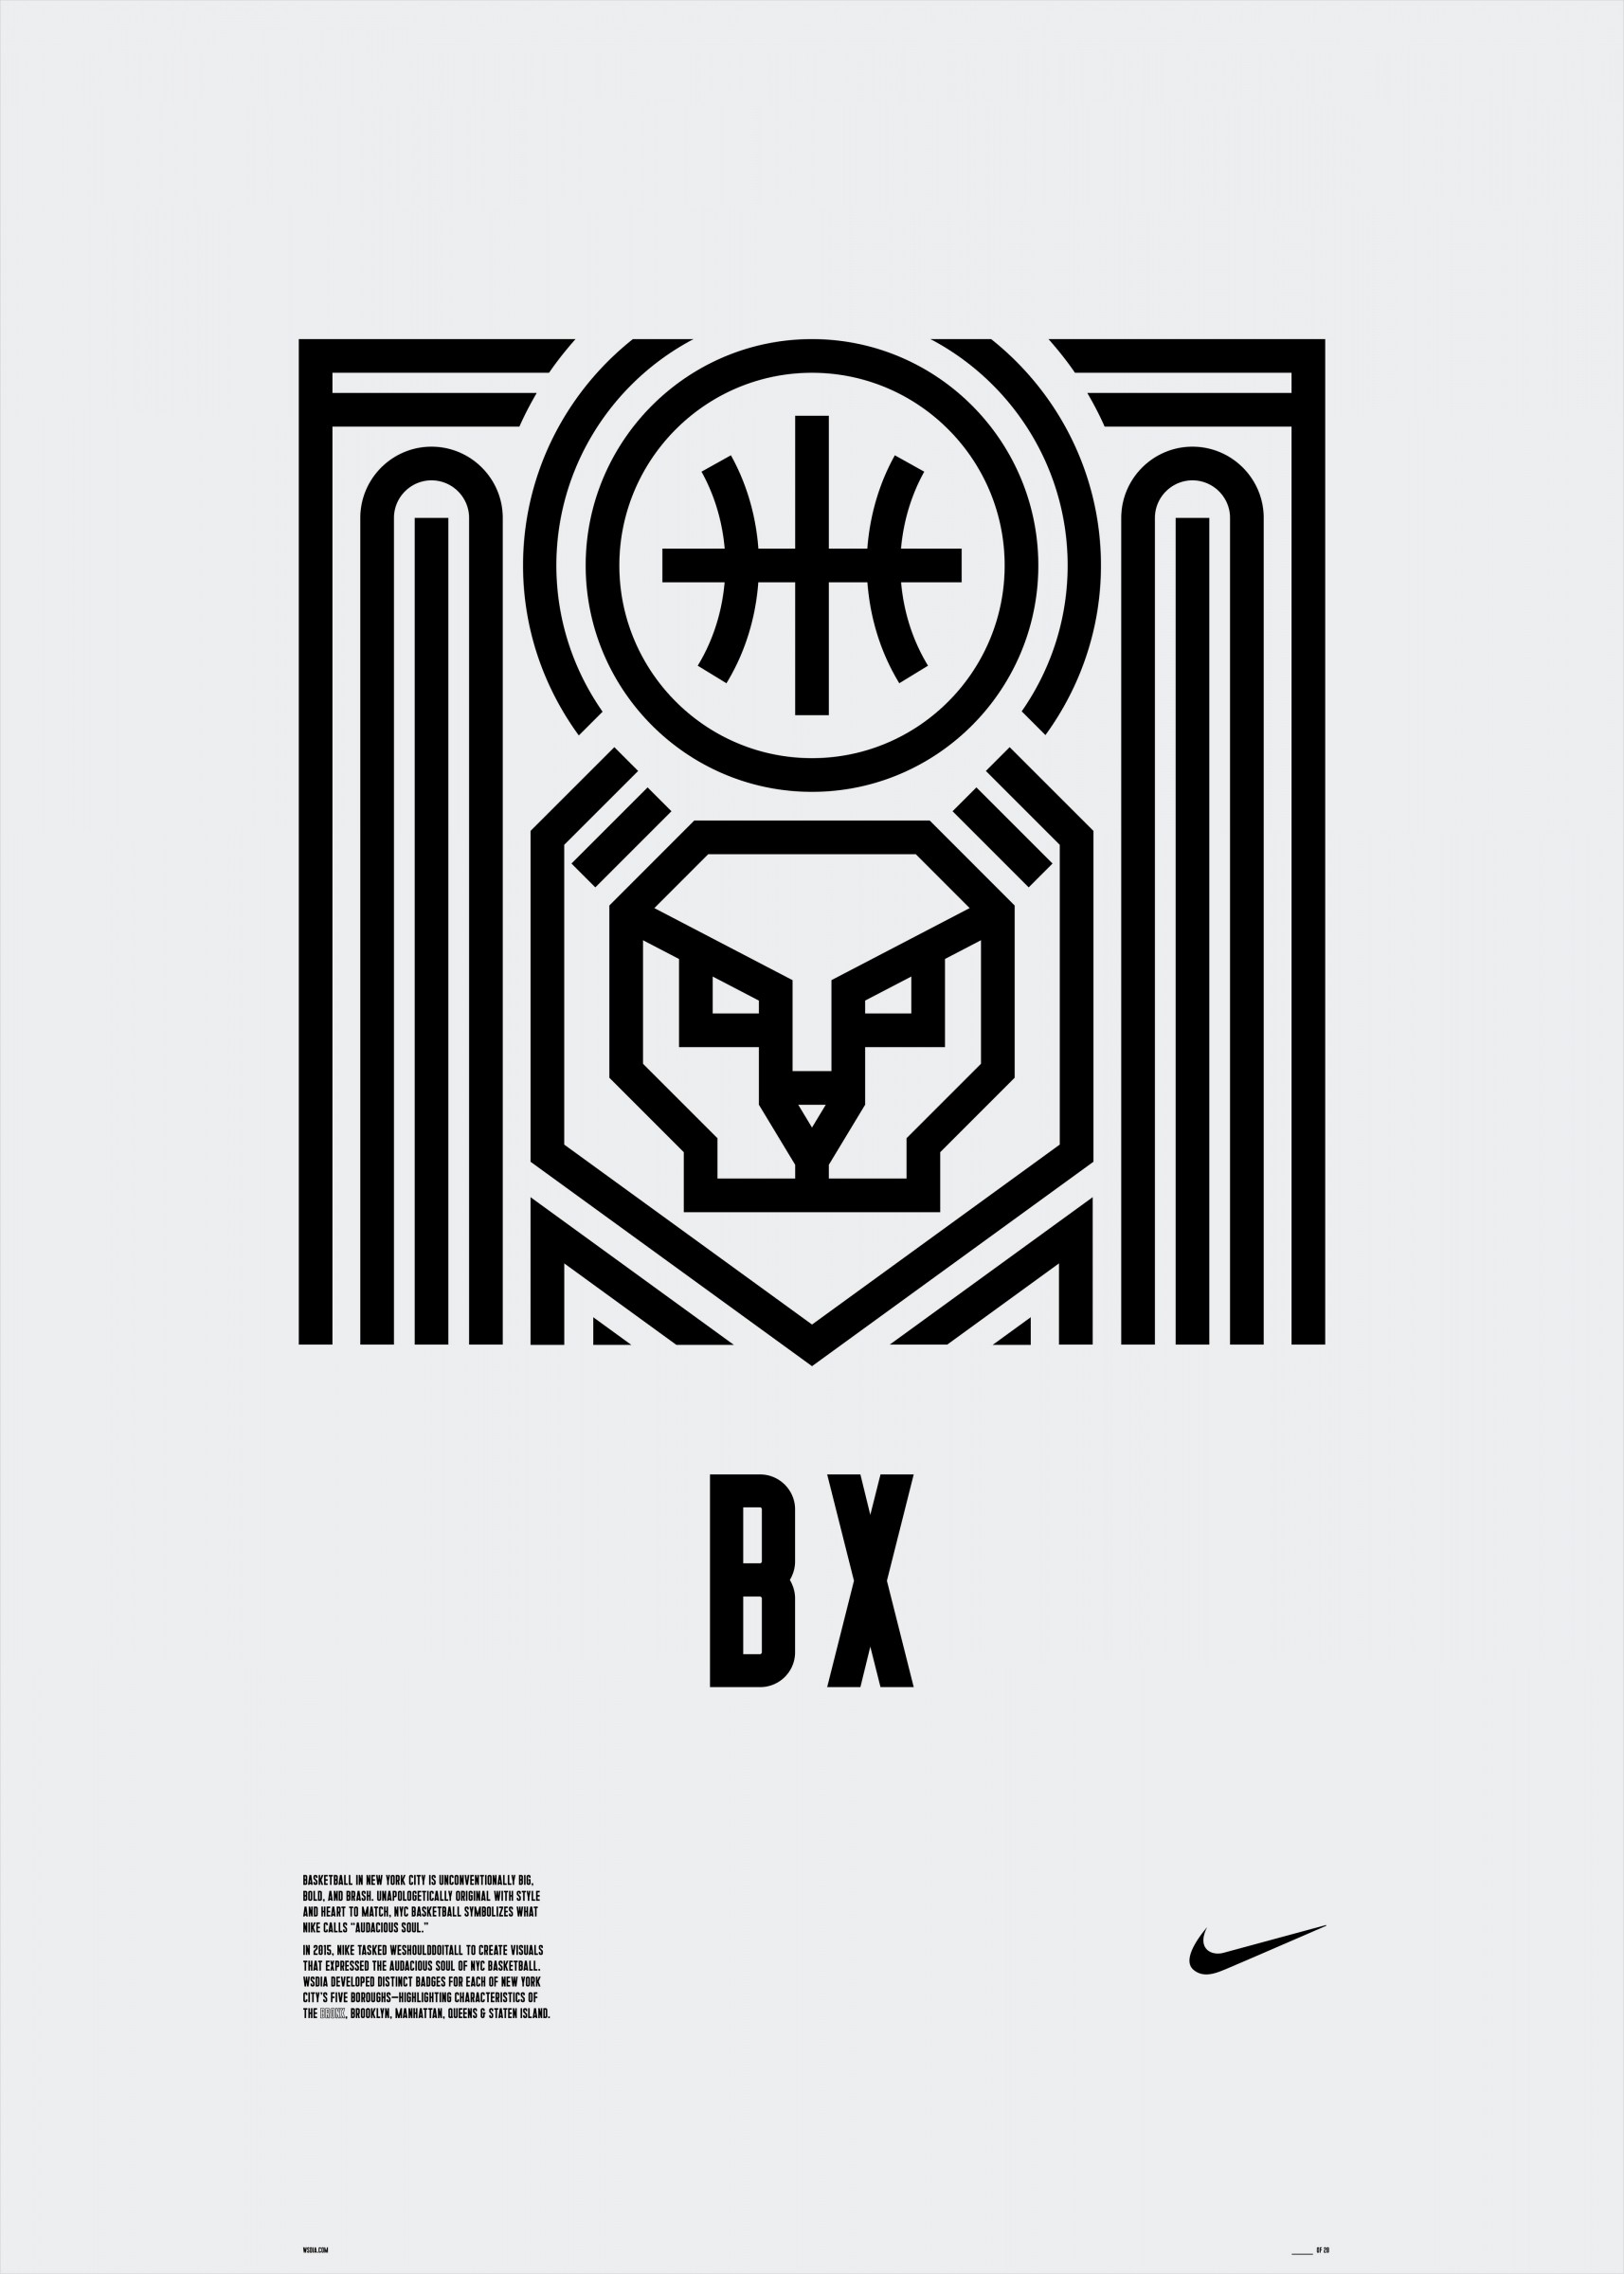 Nike Basketball Vdd Icons Weshoulddoitall